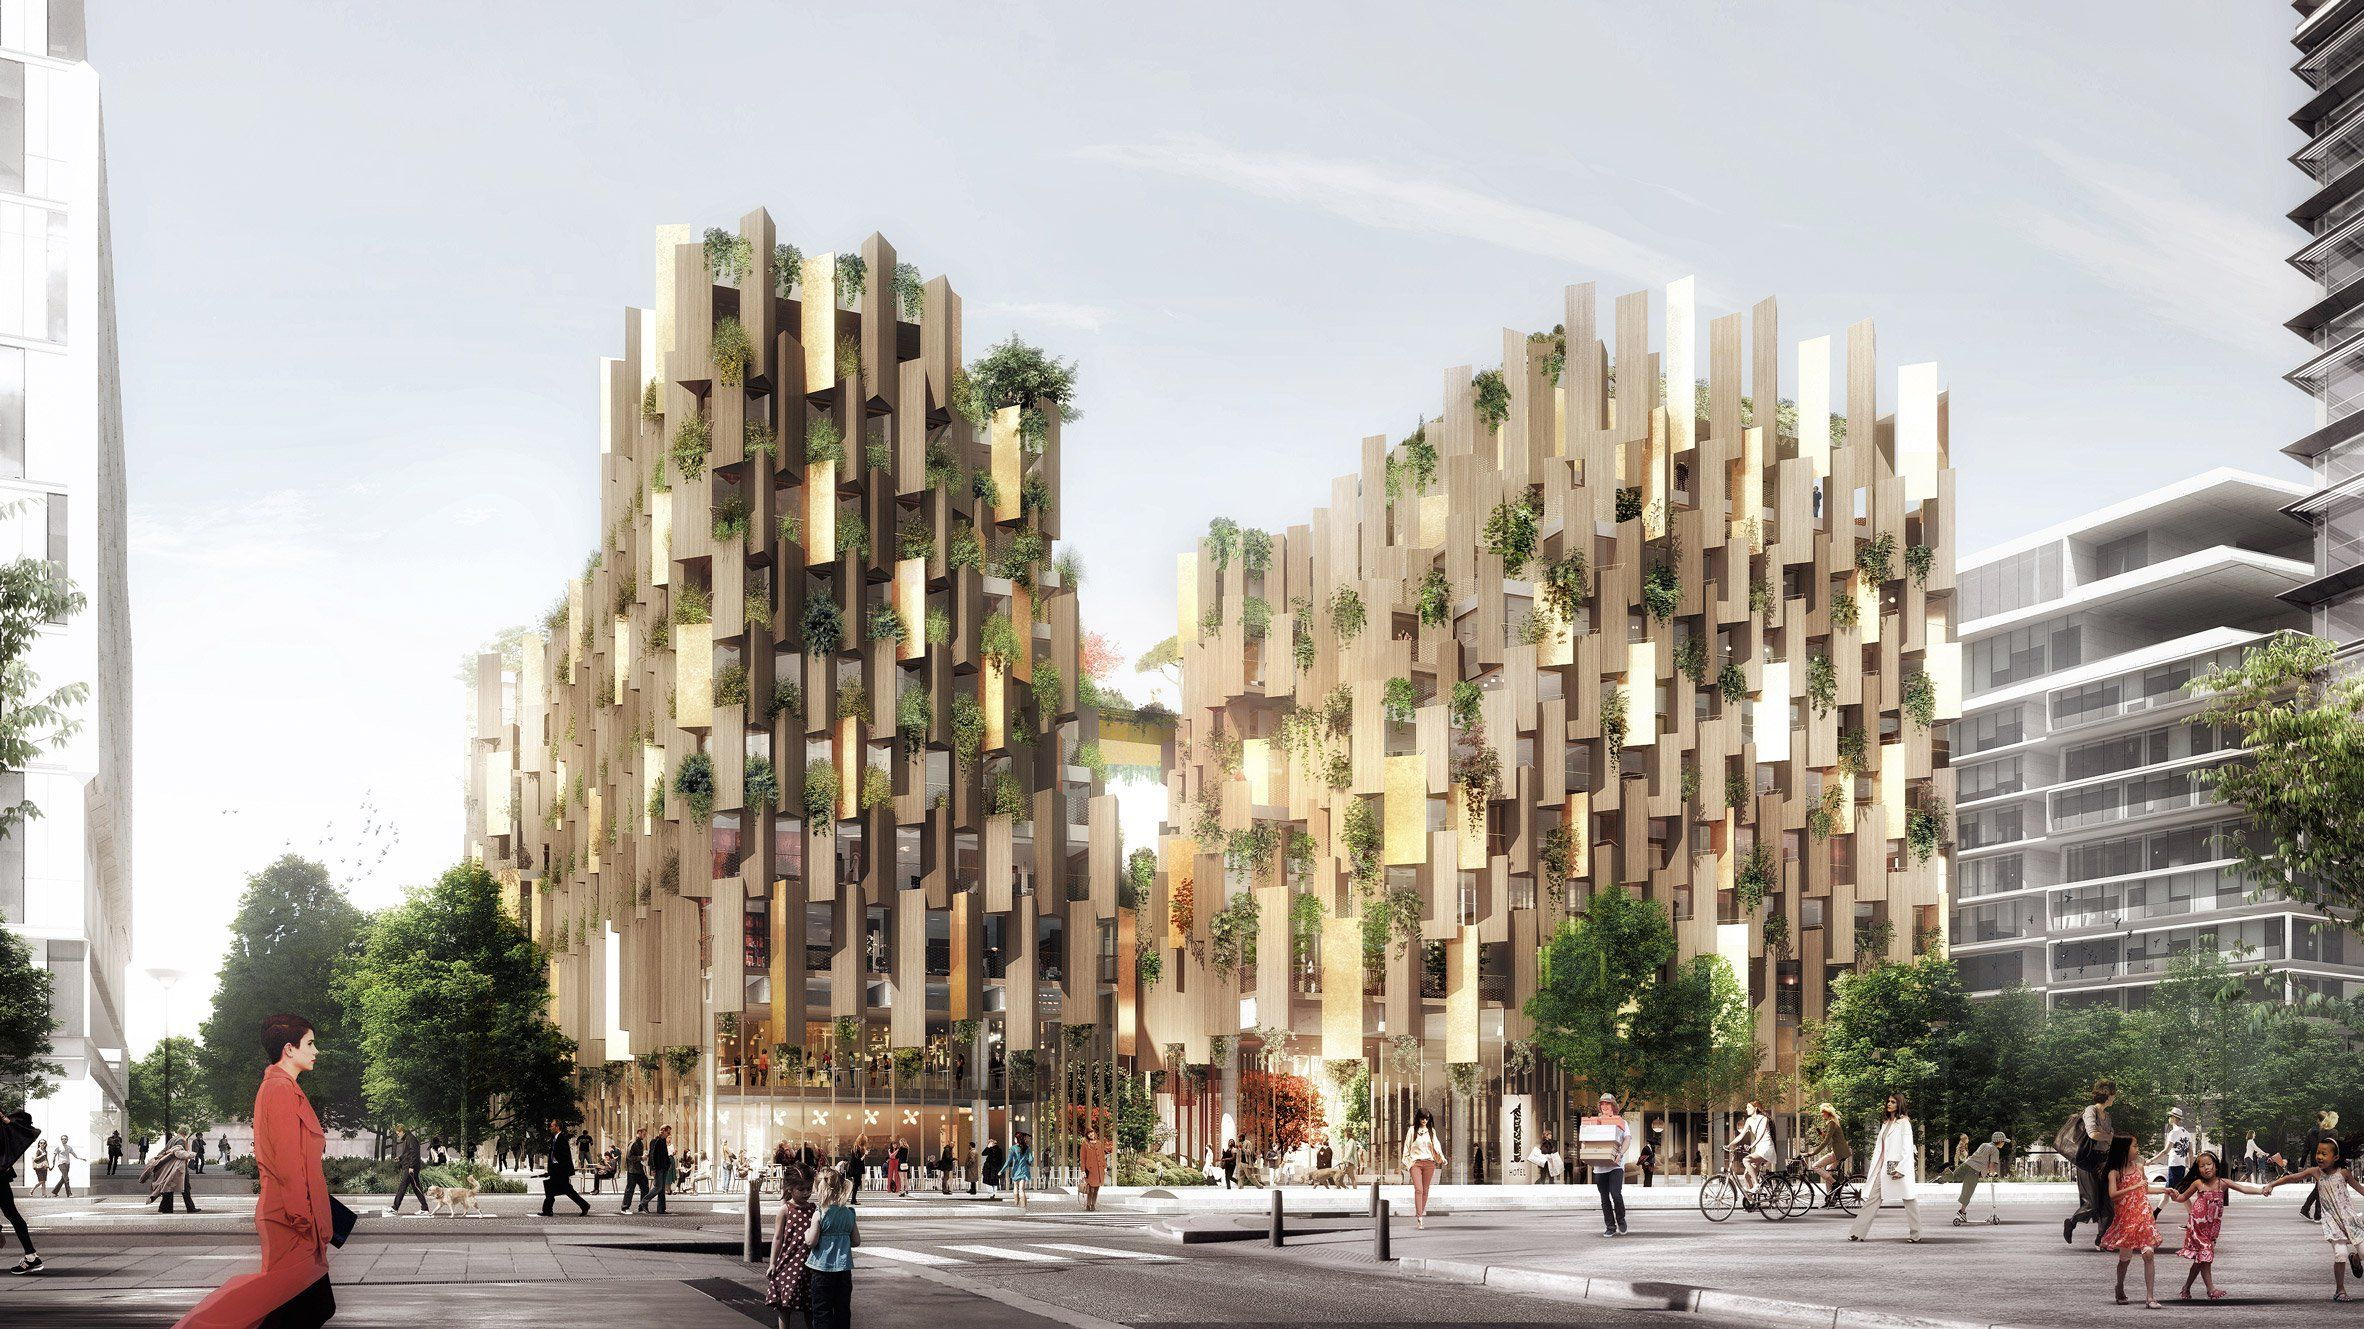 Eco luxury hotel in Paris by Kengo Kuma